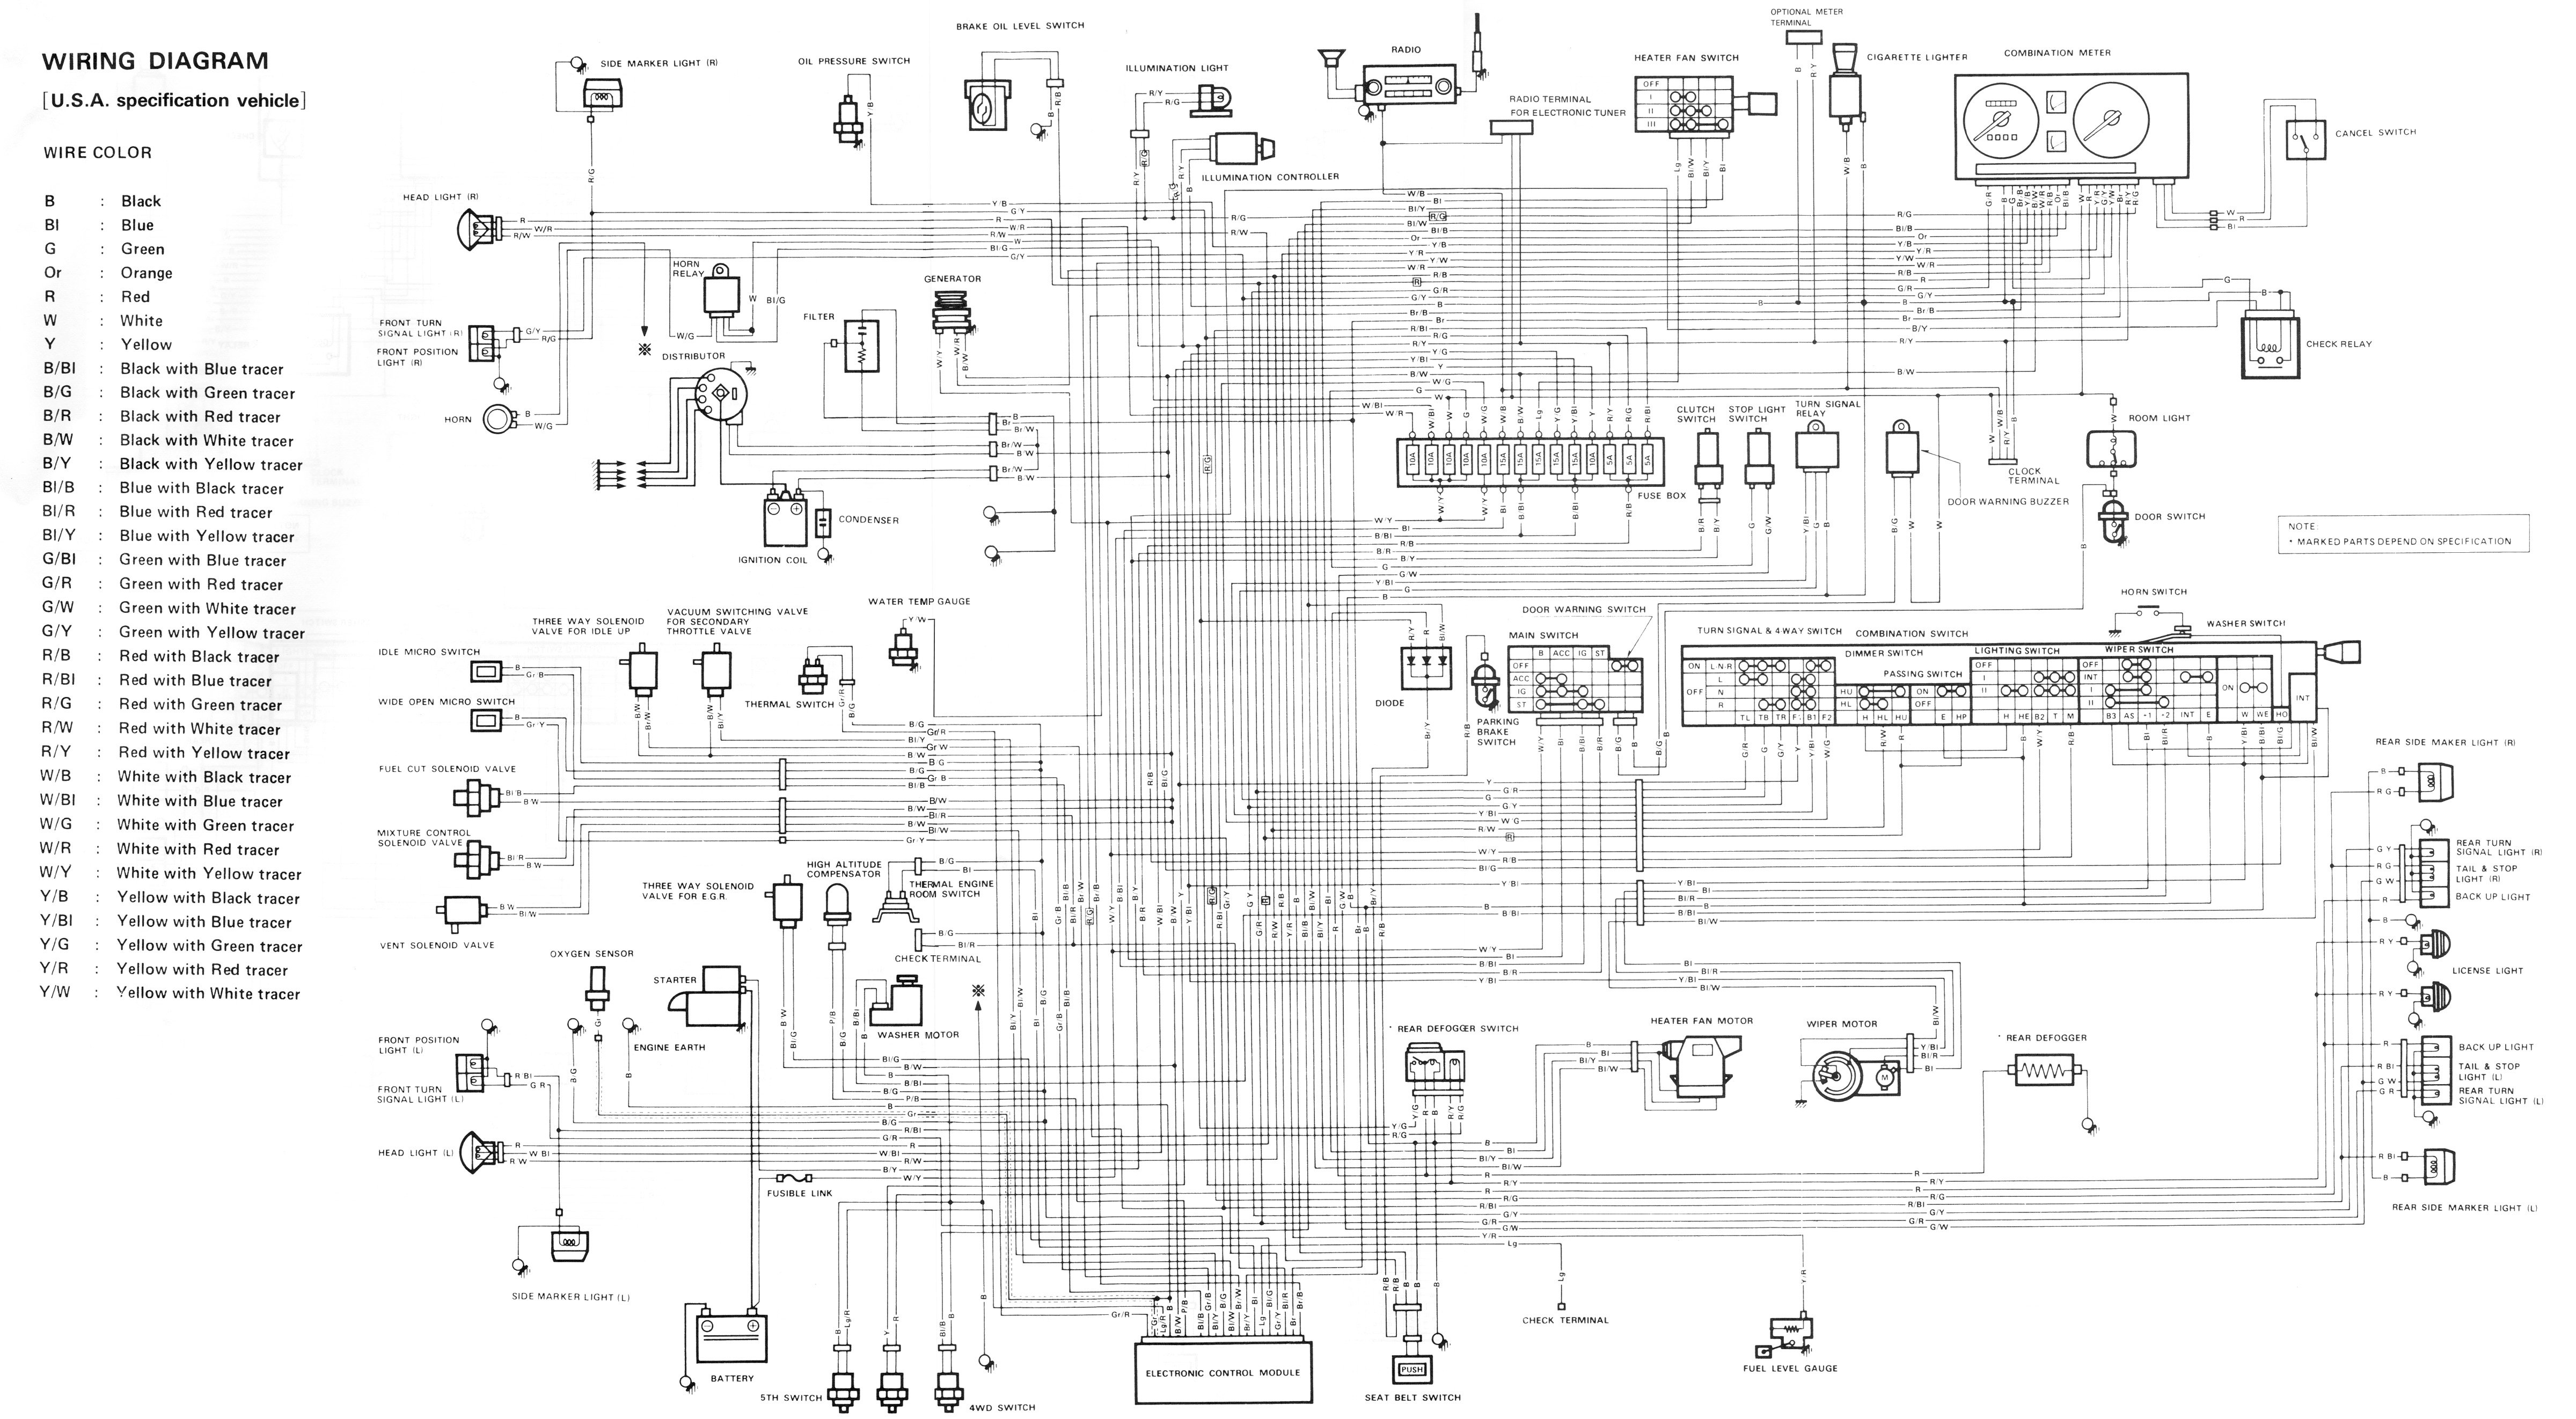 Electrical Wiring Diagram Maruti 800 : Maruti alto wiring diagram pdf images